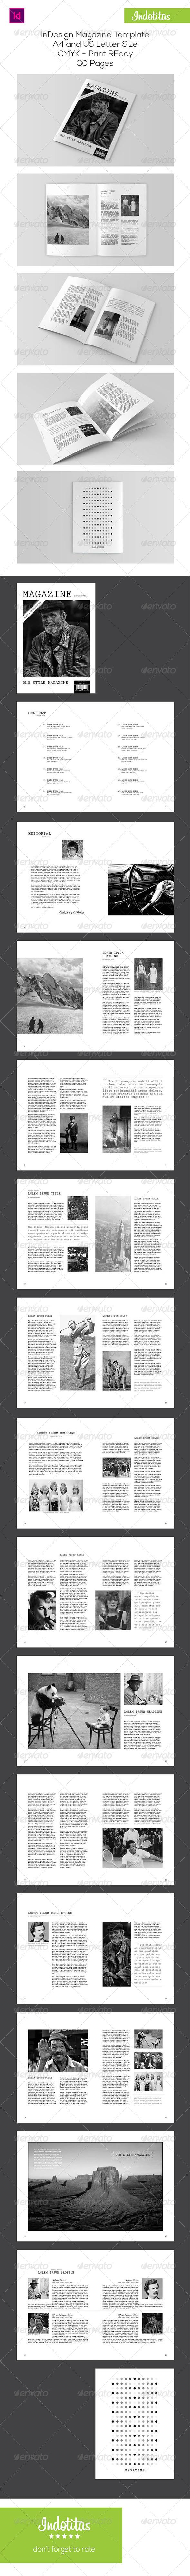 GraphicRiver Vintage Magazine Template 7469652